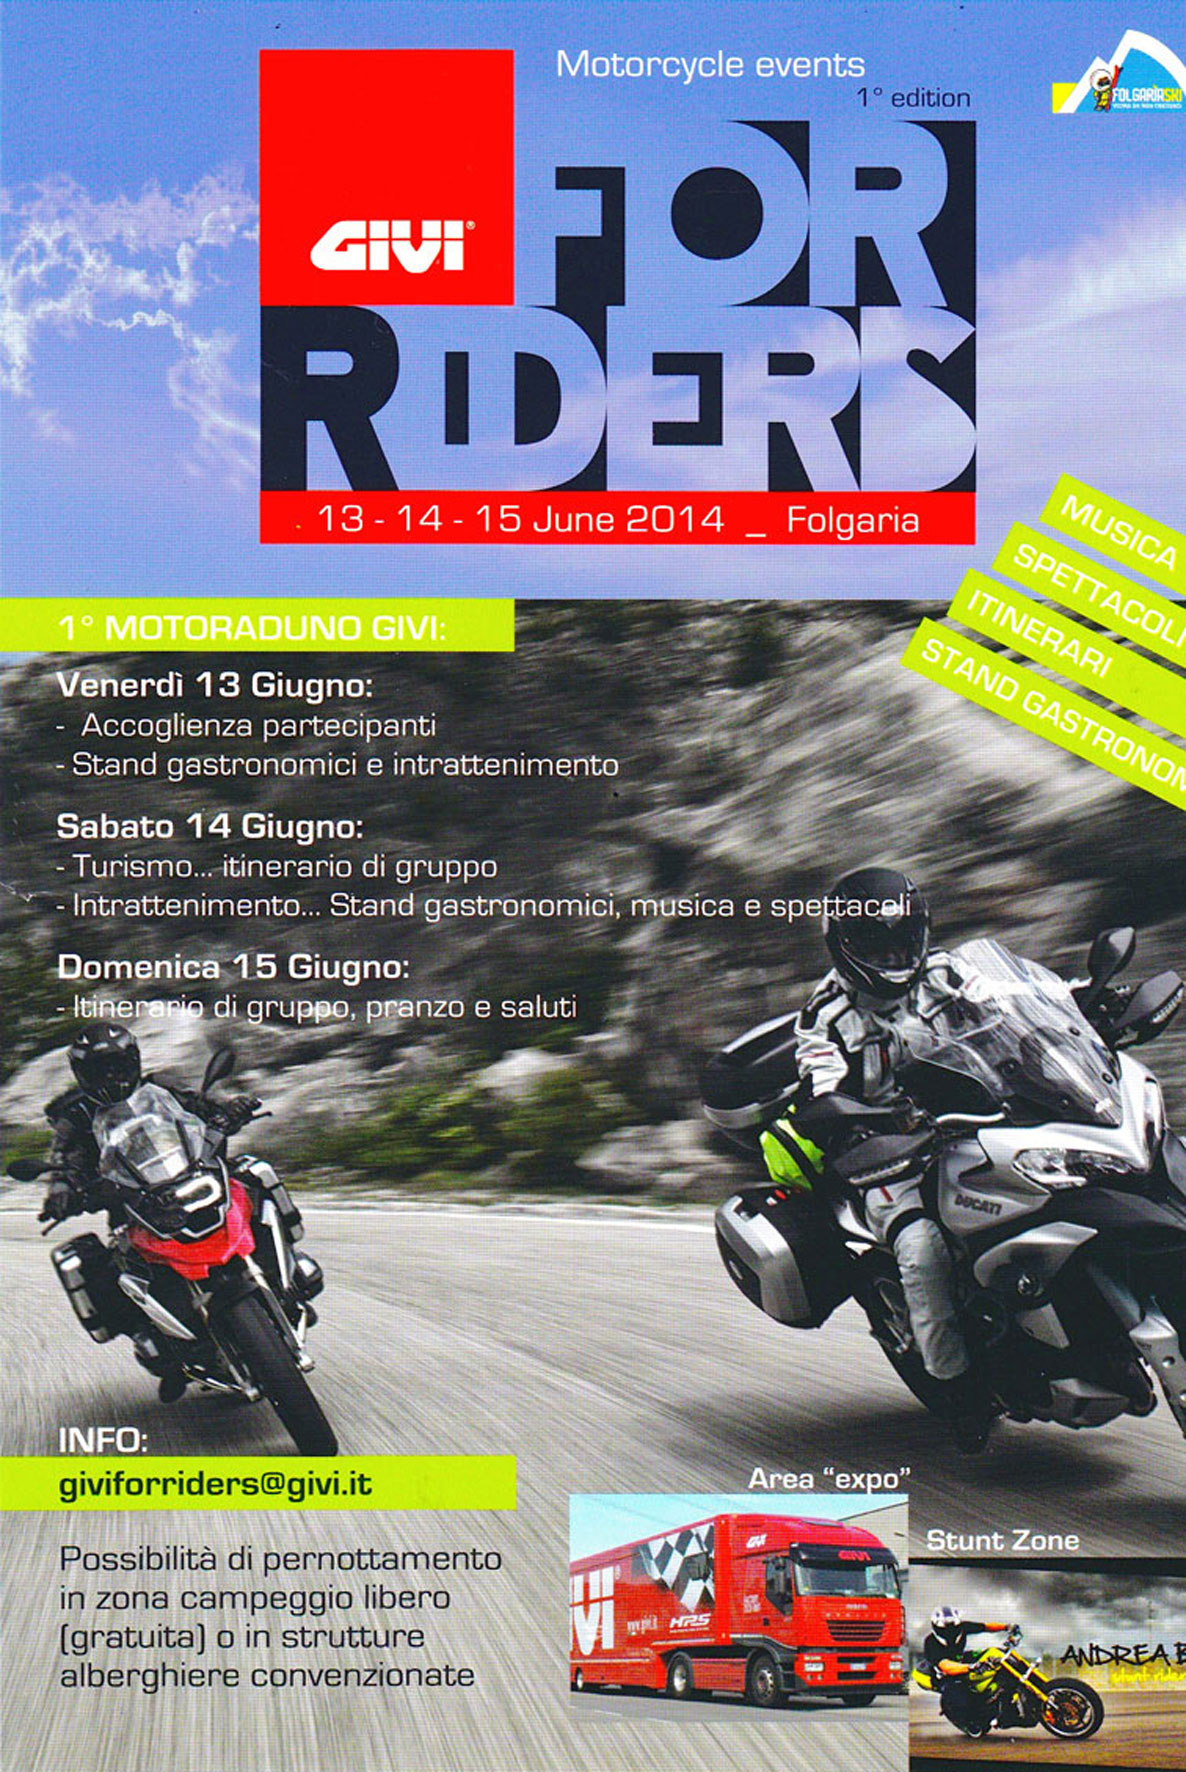 Motoraduno GIVI FOR RIDERS